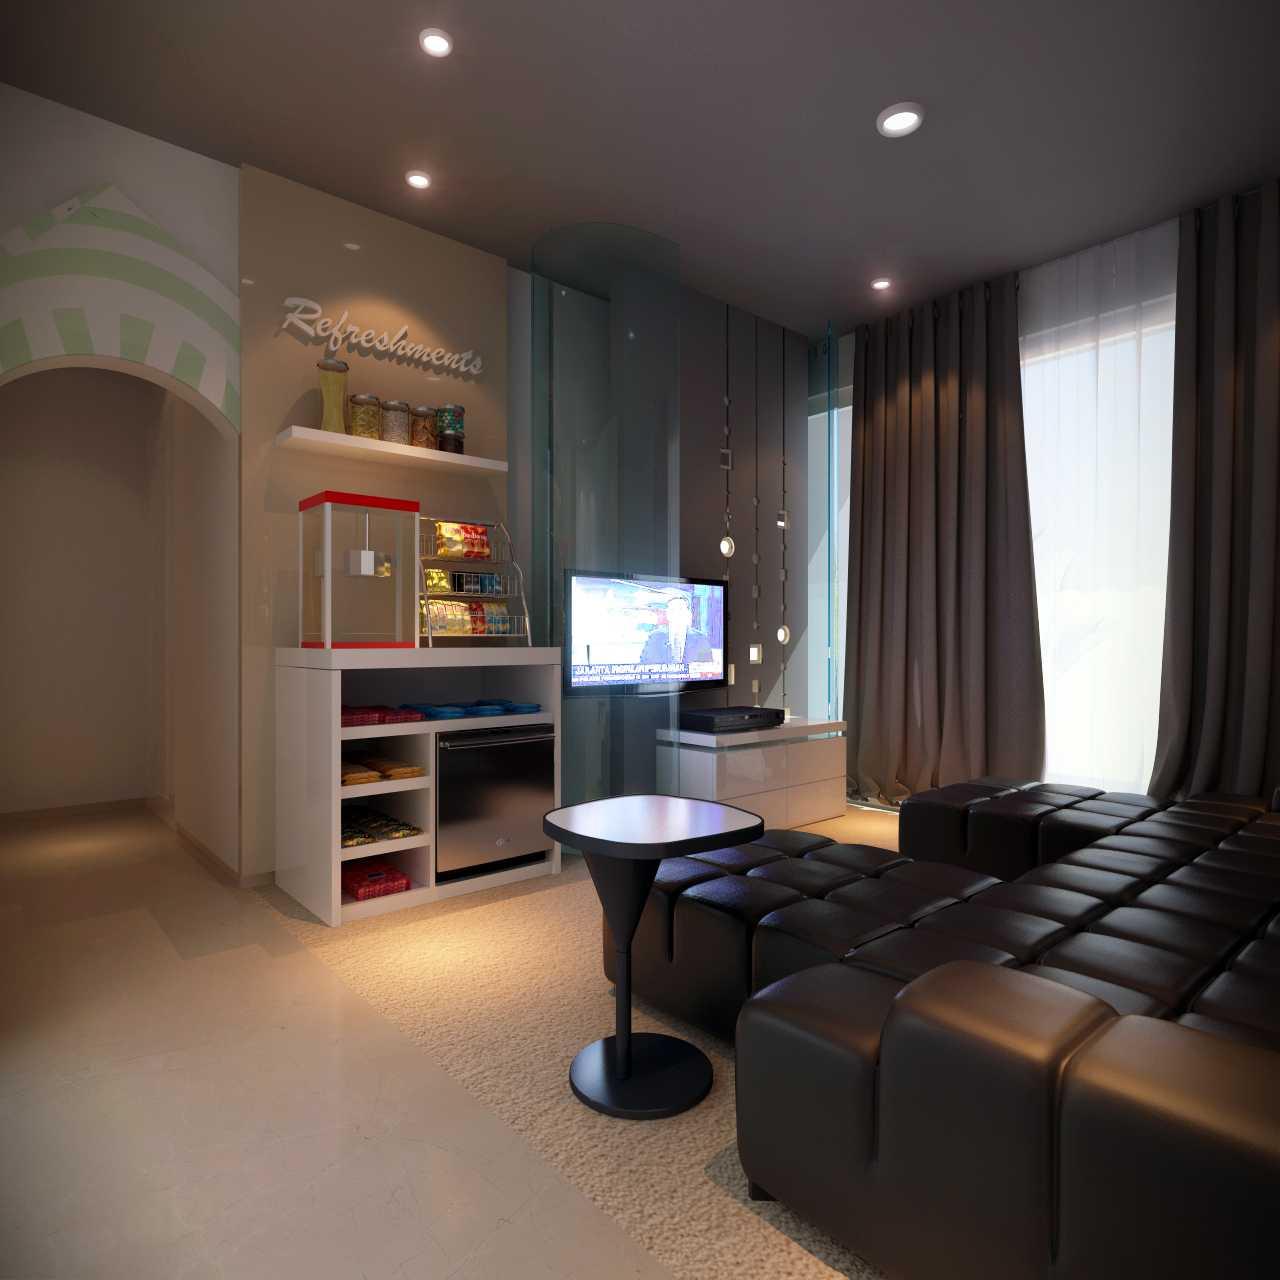 Meili Darmasetiawan Summerbliss Residence Lippo Cikarang Bekasi Lippo Cikarang Bekasi Living-Room-Atas Modern  13795